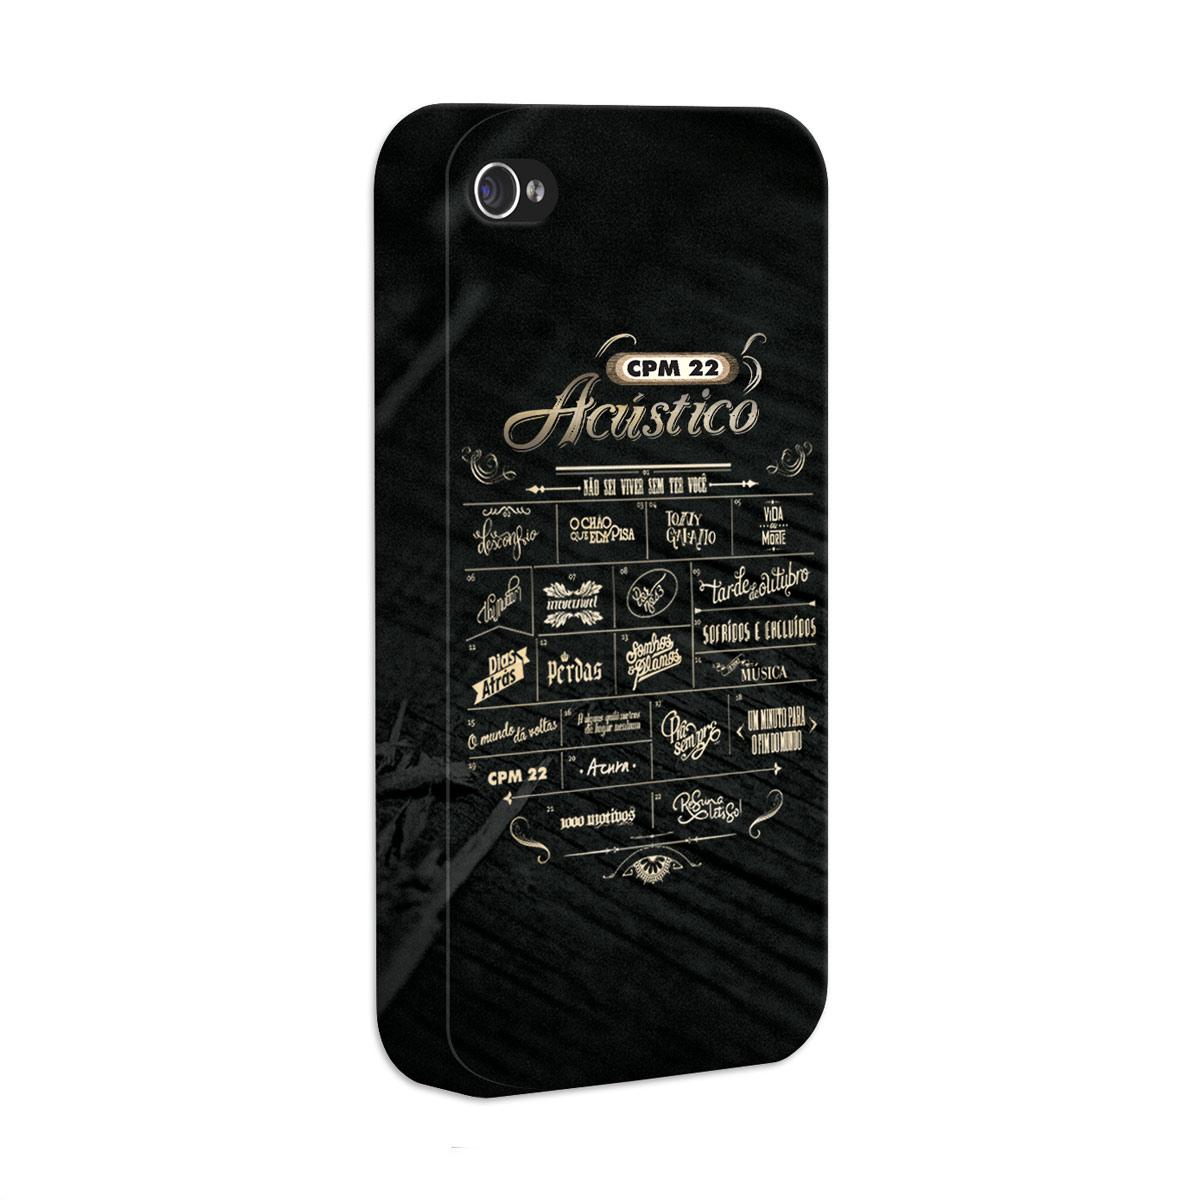 Capa de iPhone 4/4S CPM 22 Setlist